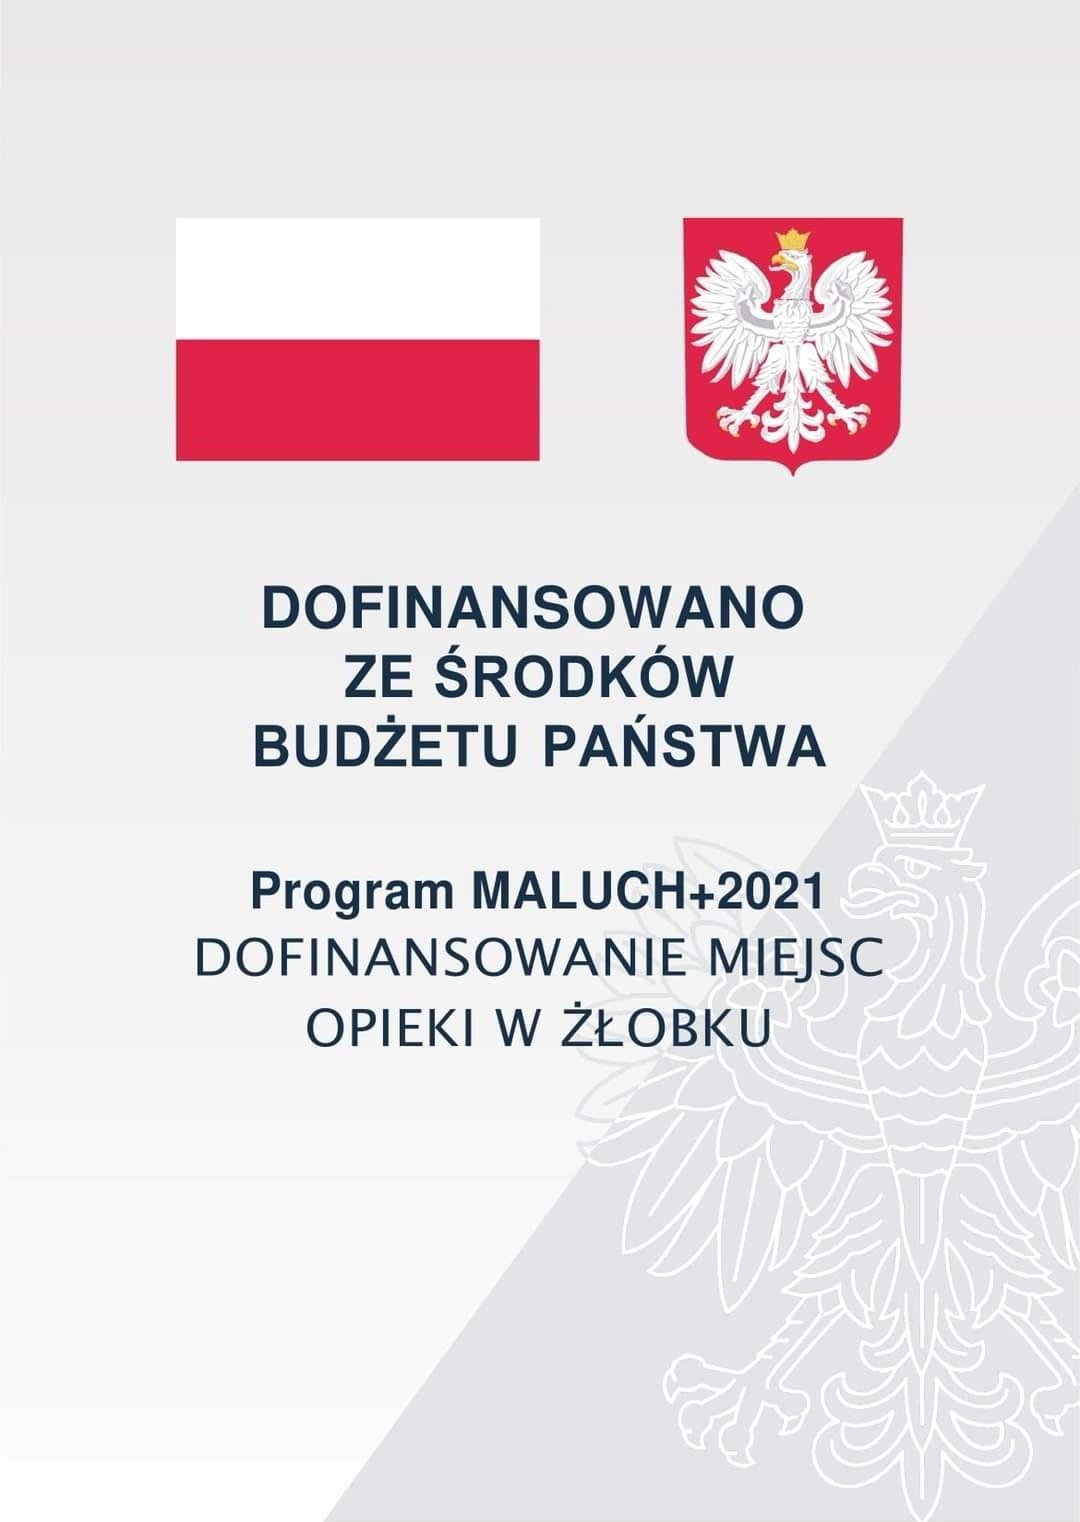 Program Maluch+ 2021